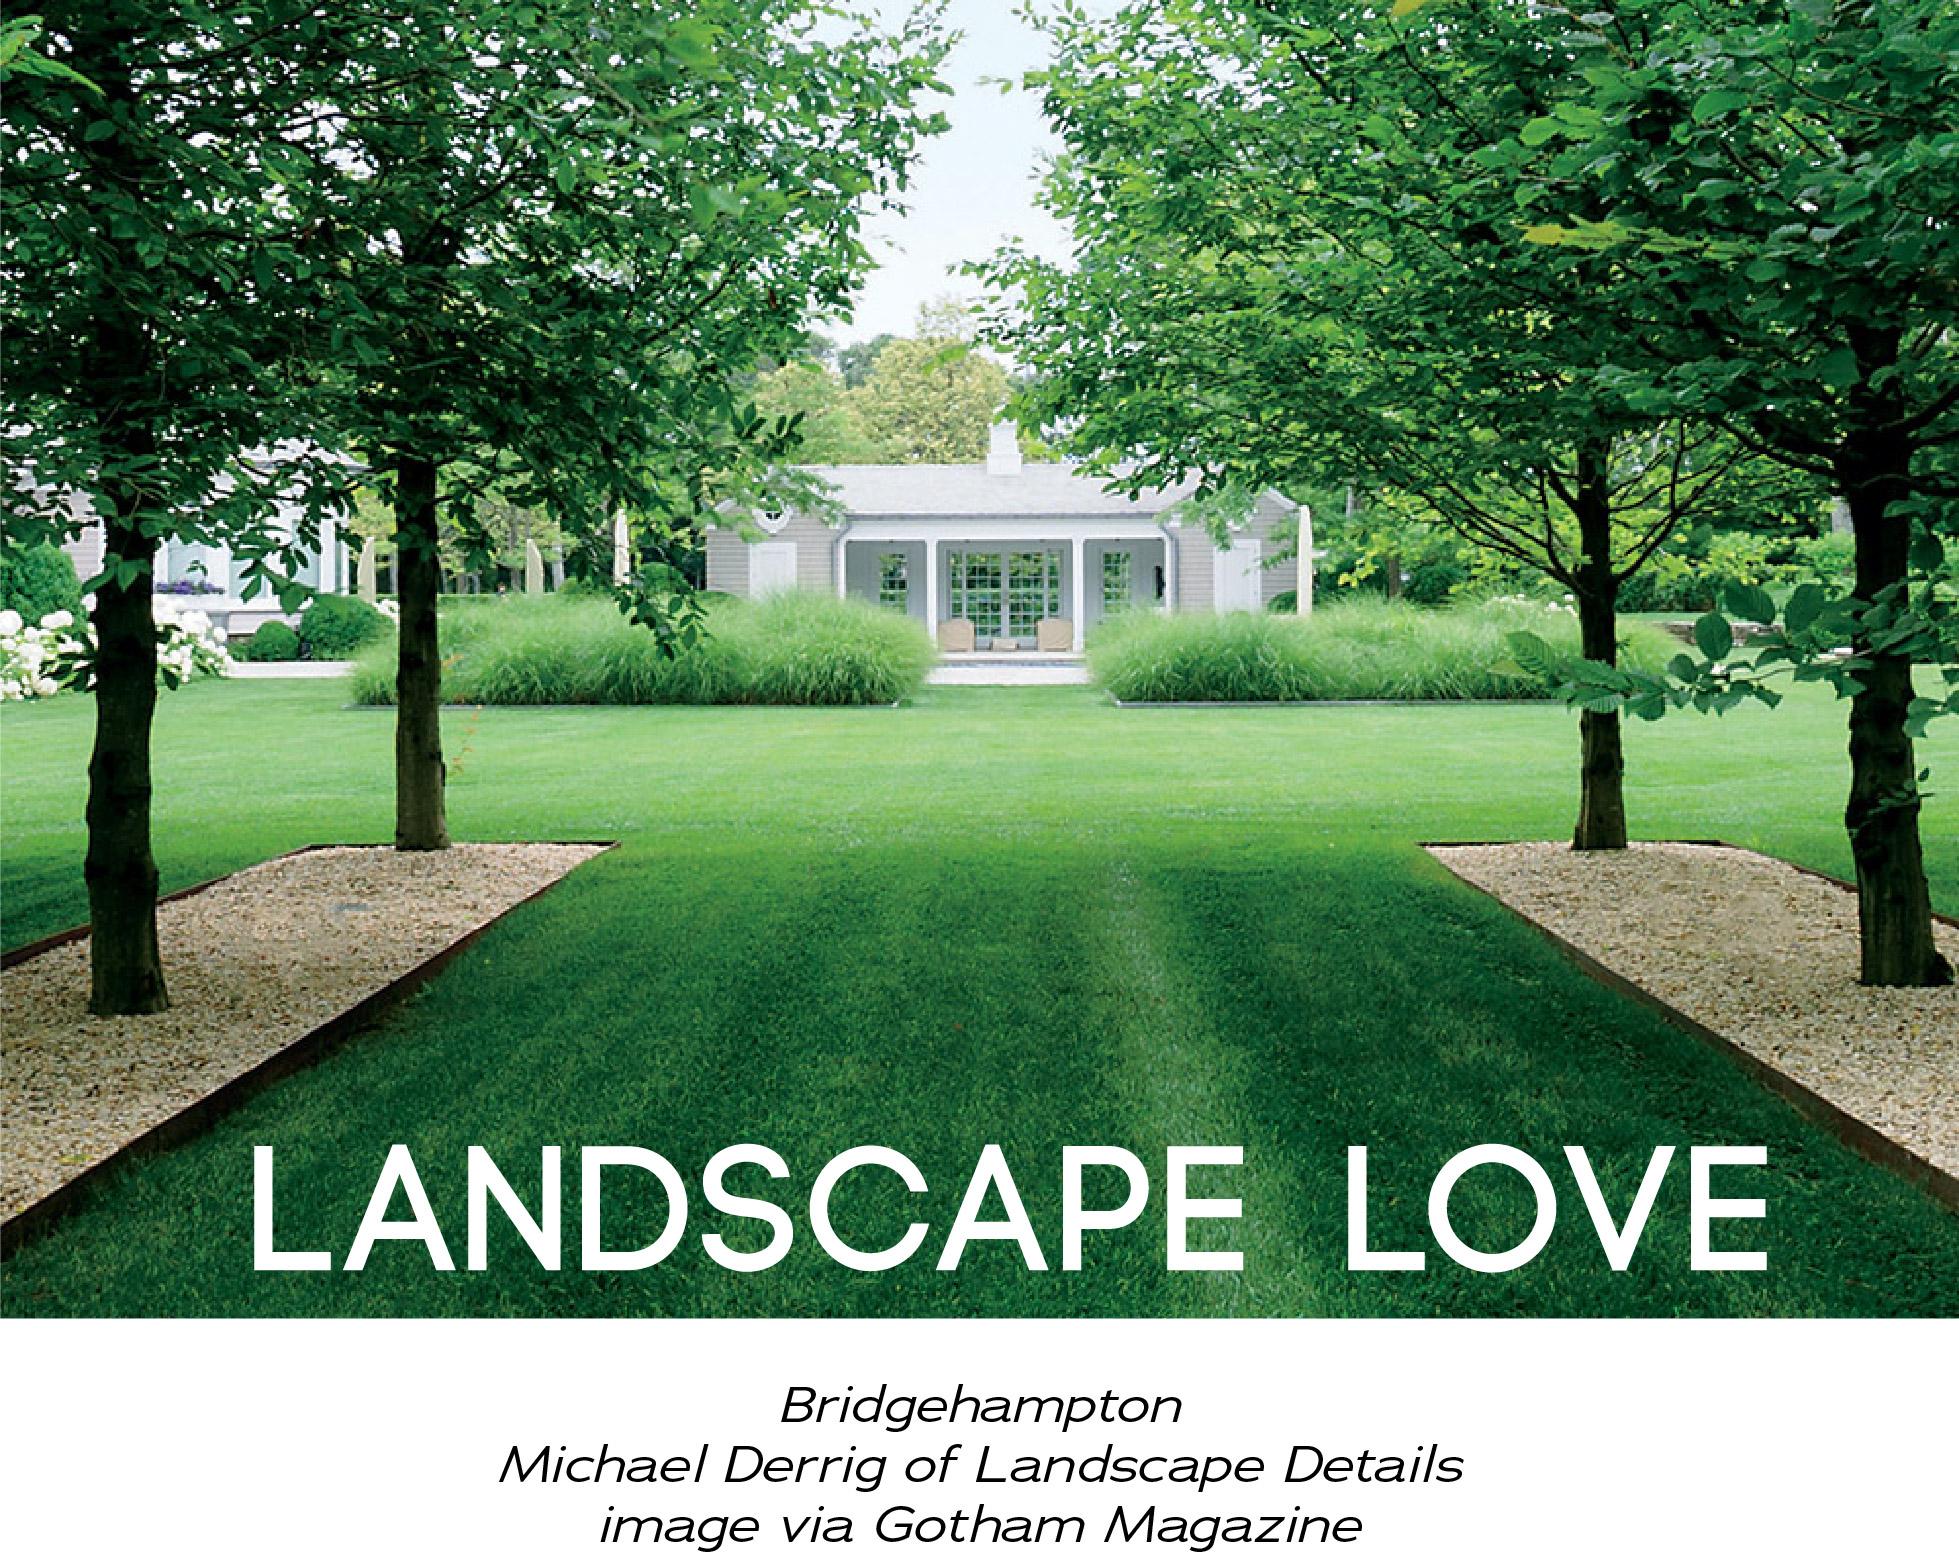 LandScapeLove_Bridgehamton